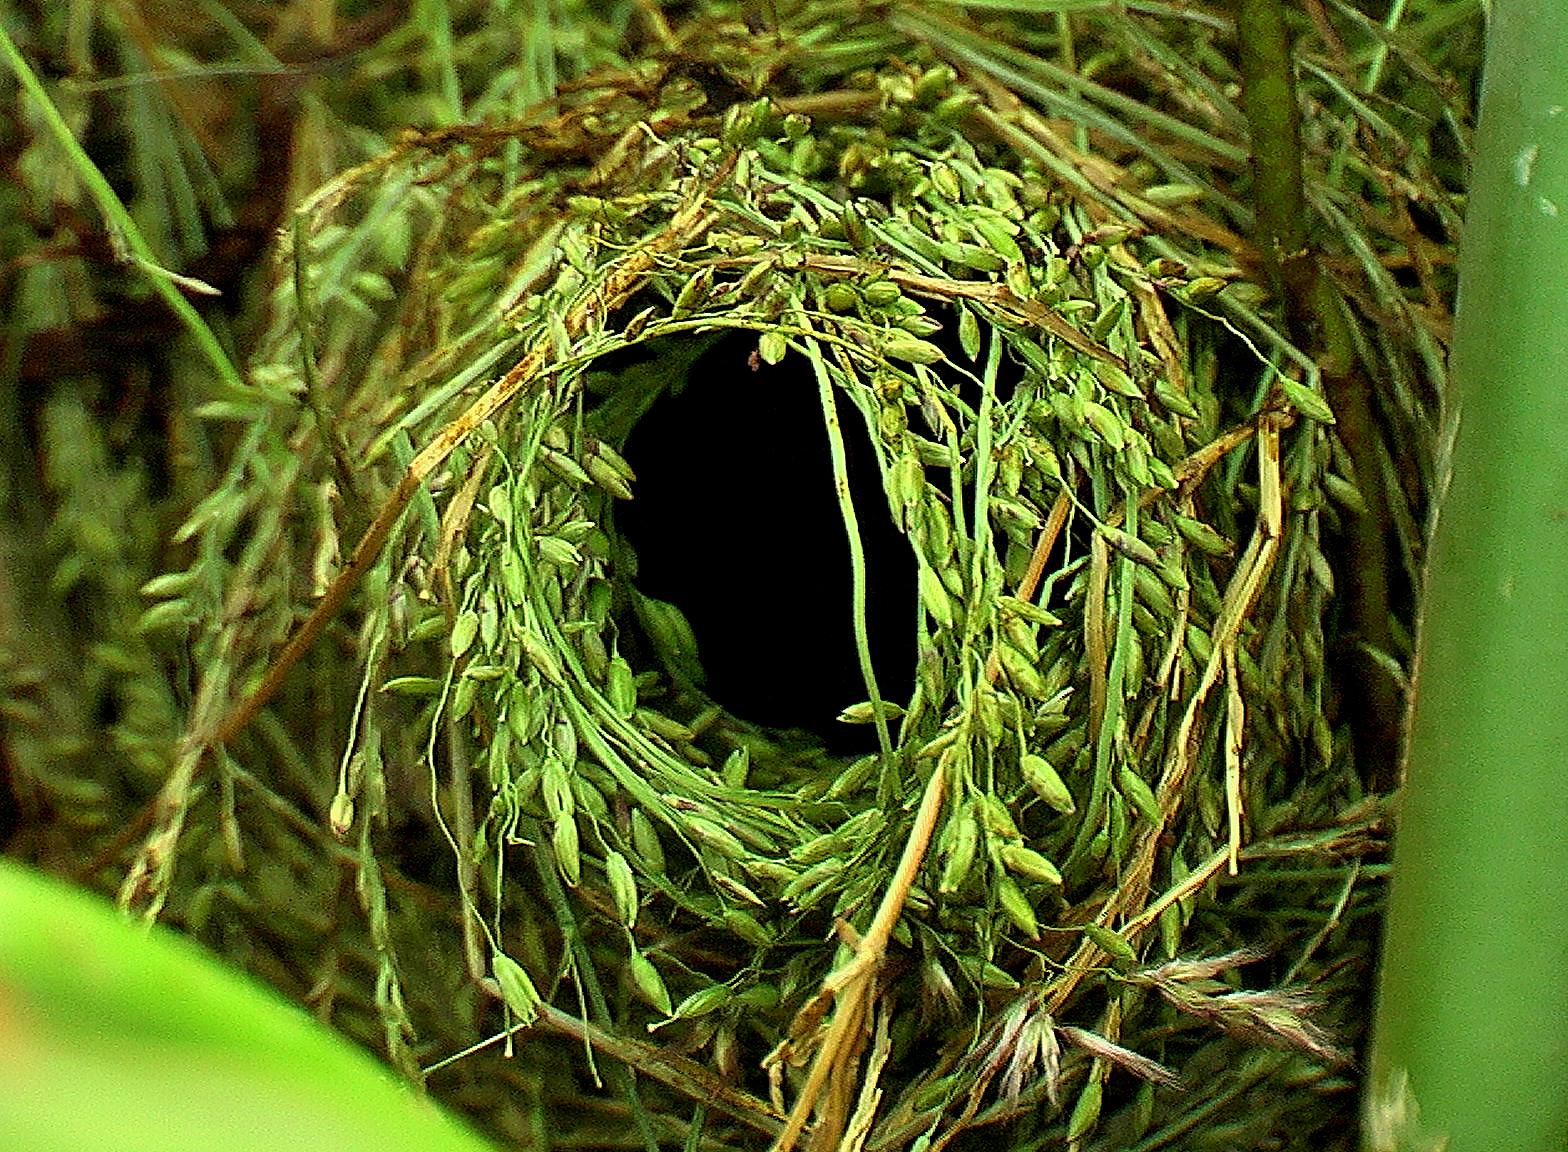 Tổ chim Common waxbill